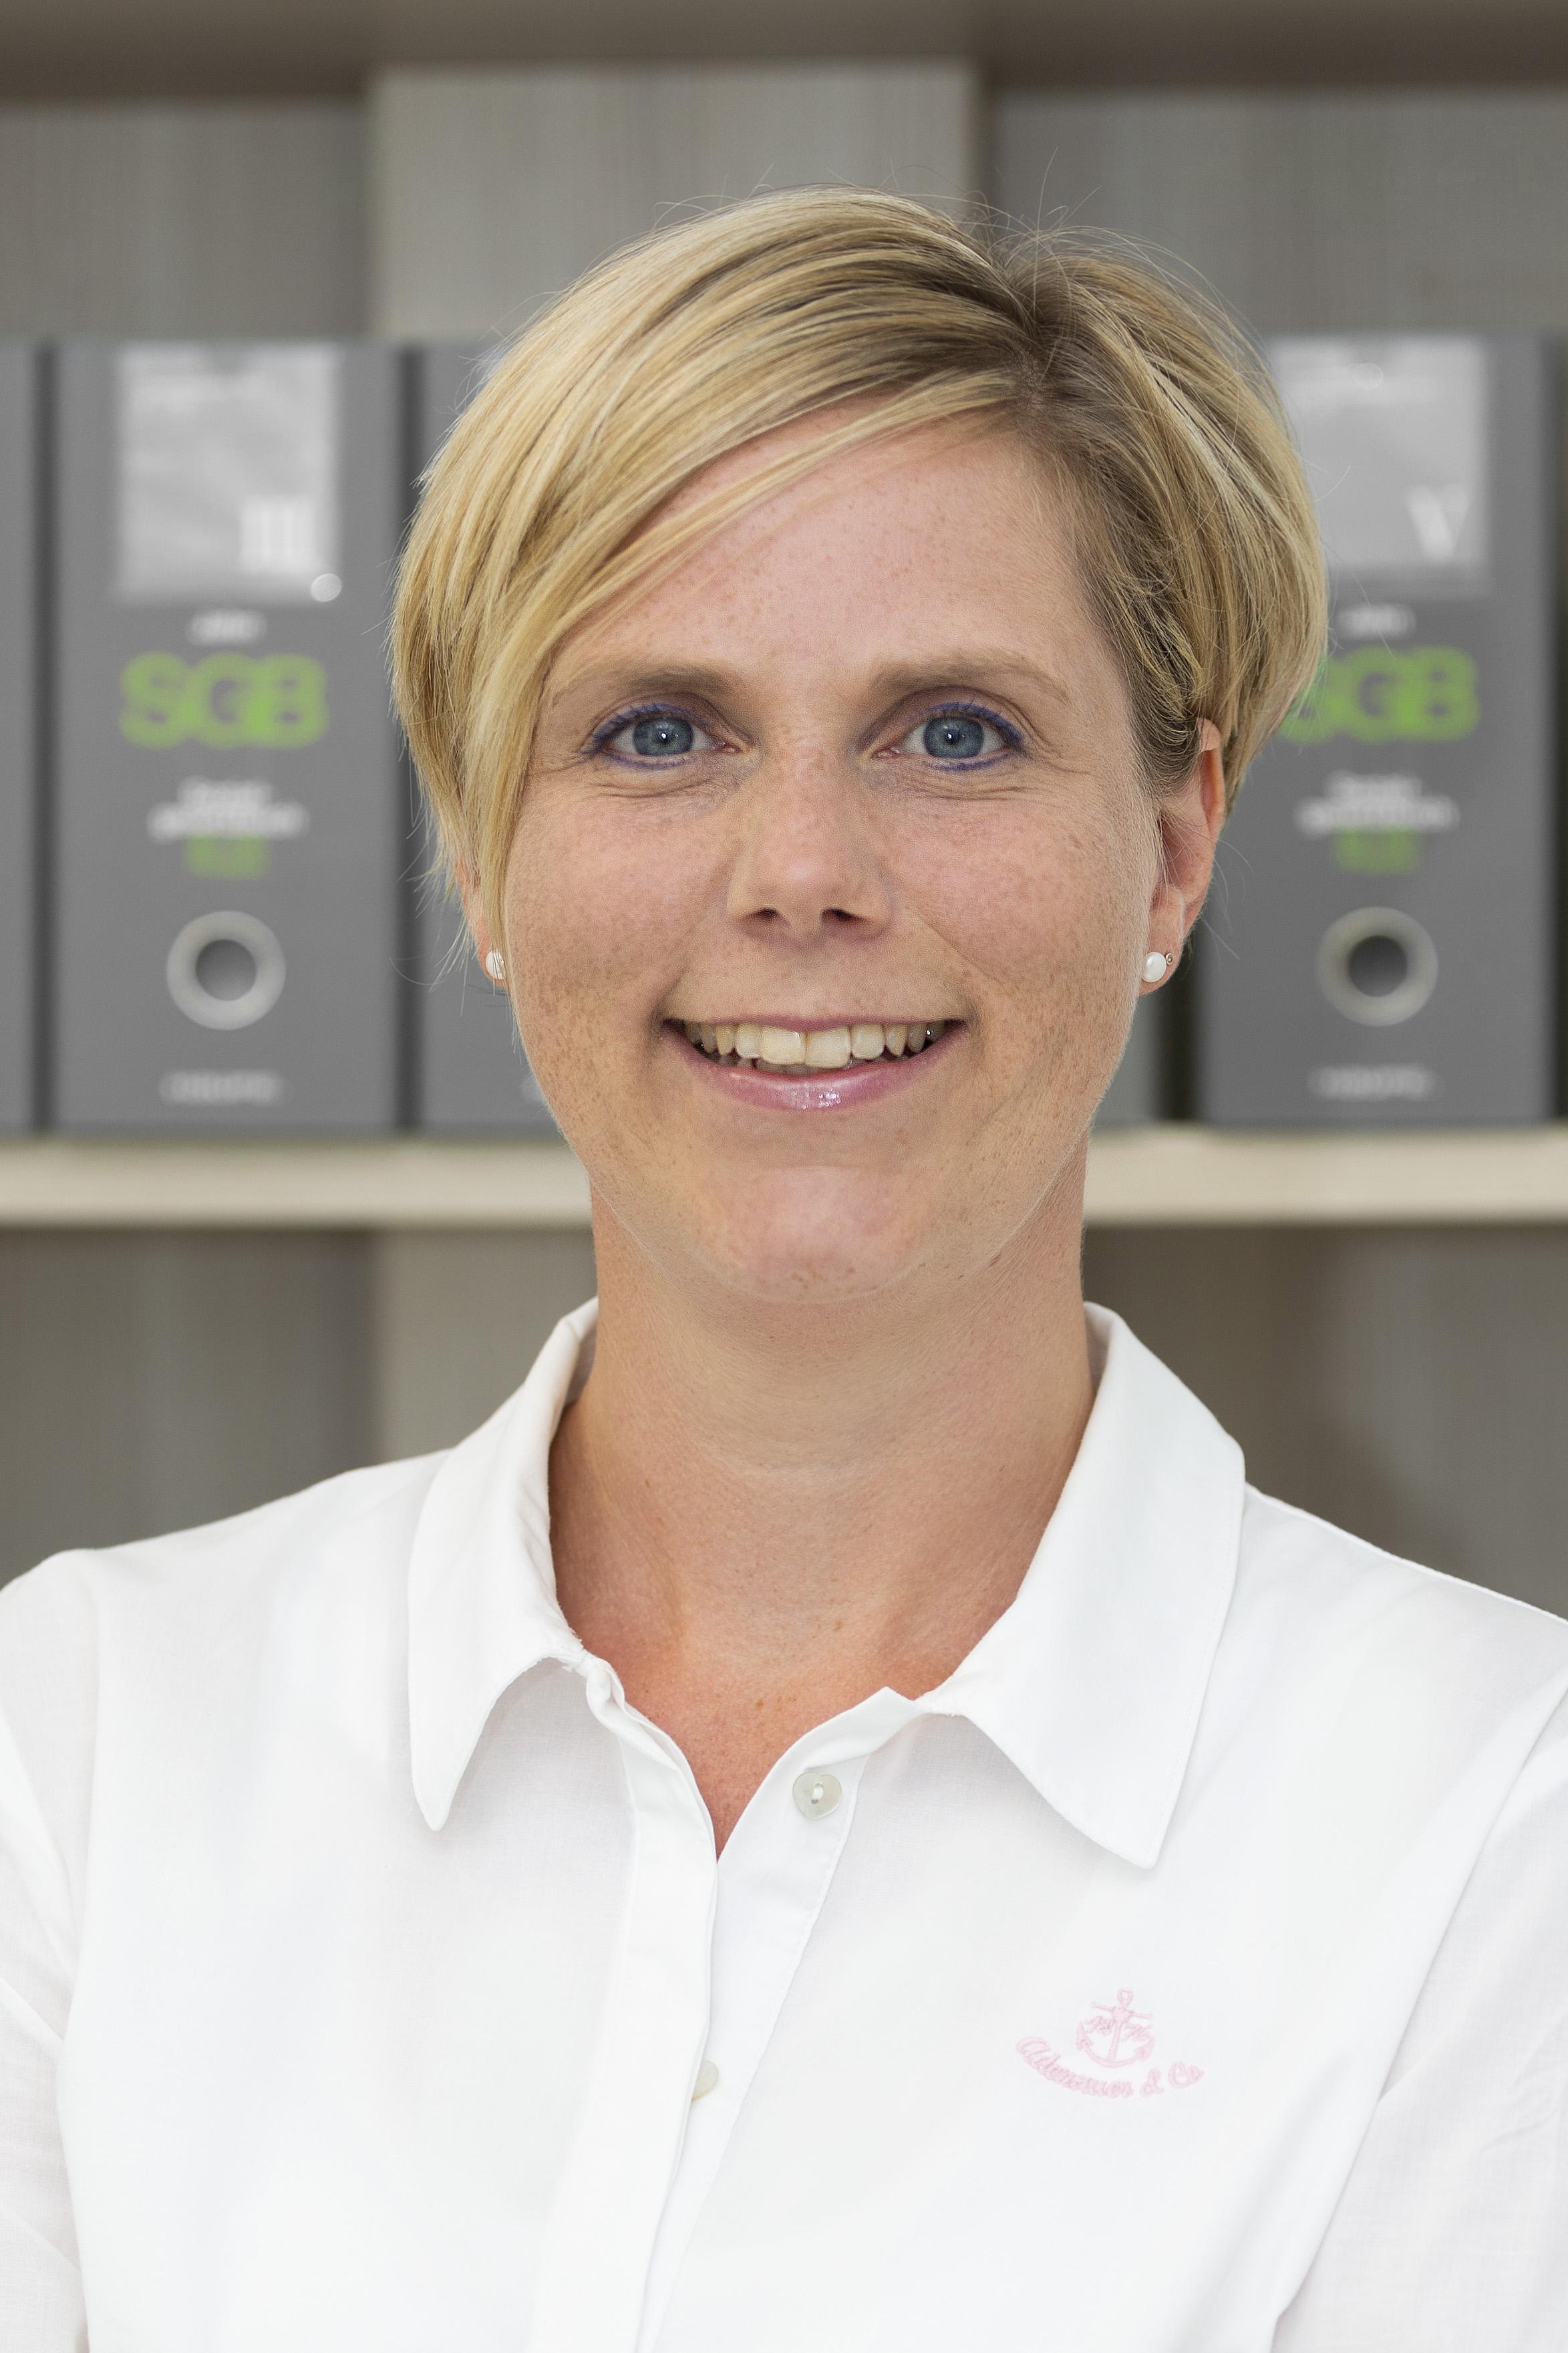 Stefanie Birken-Seeler